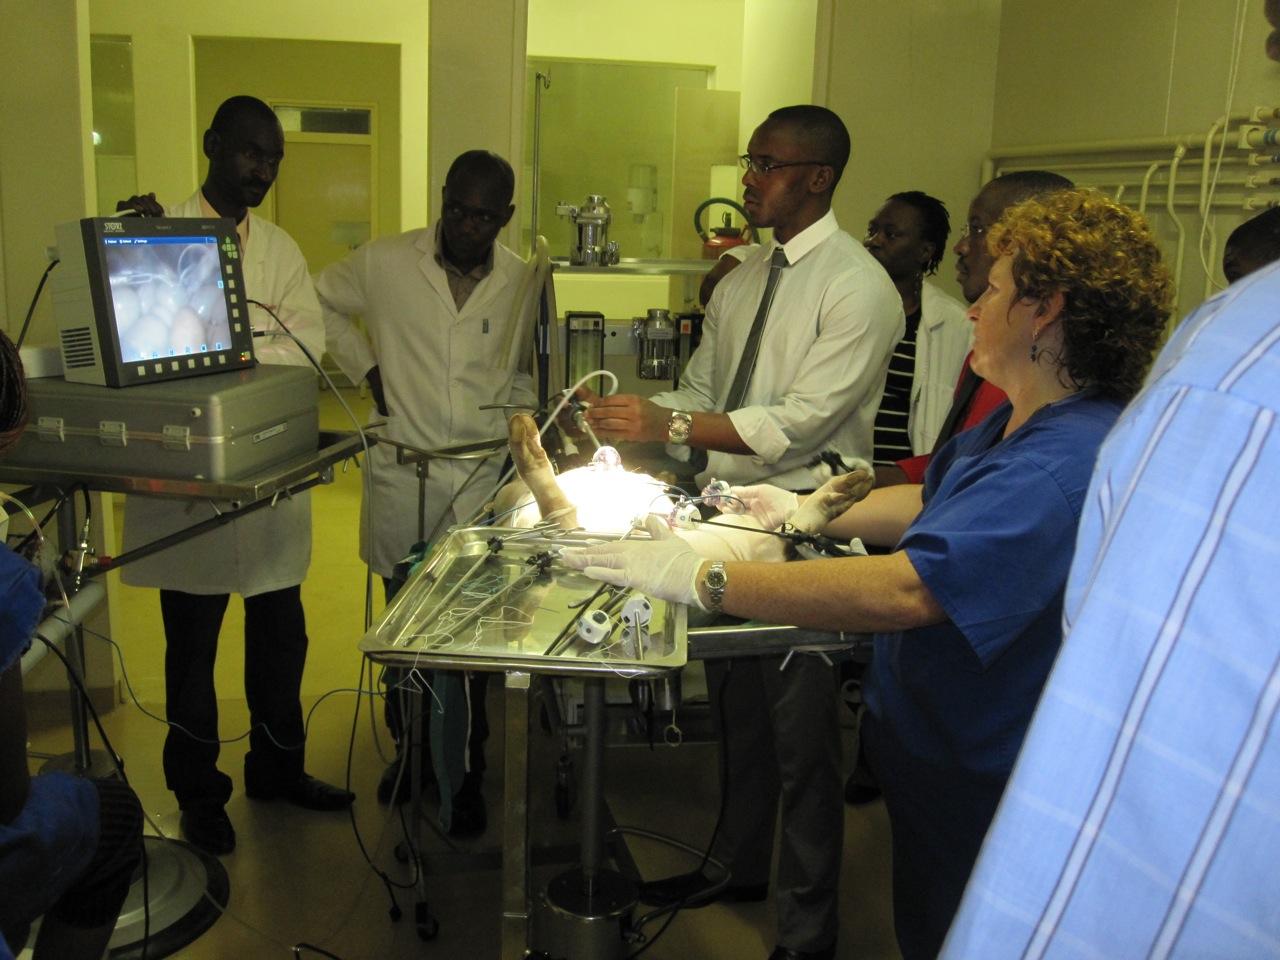 Surgery in Zimbabwe